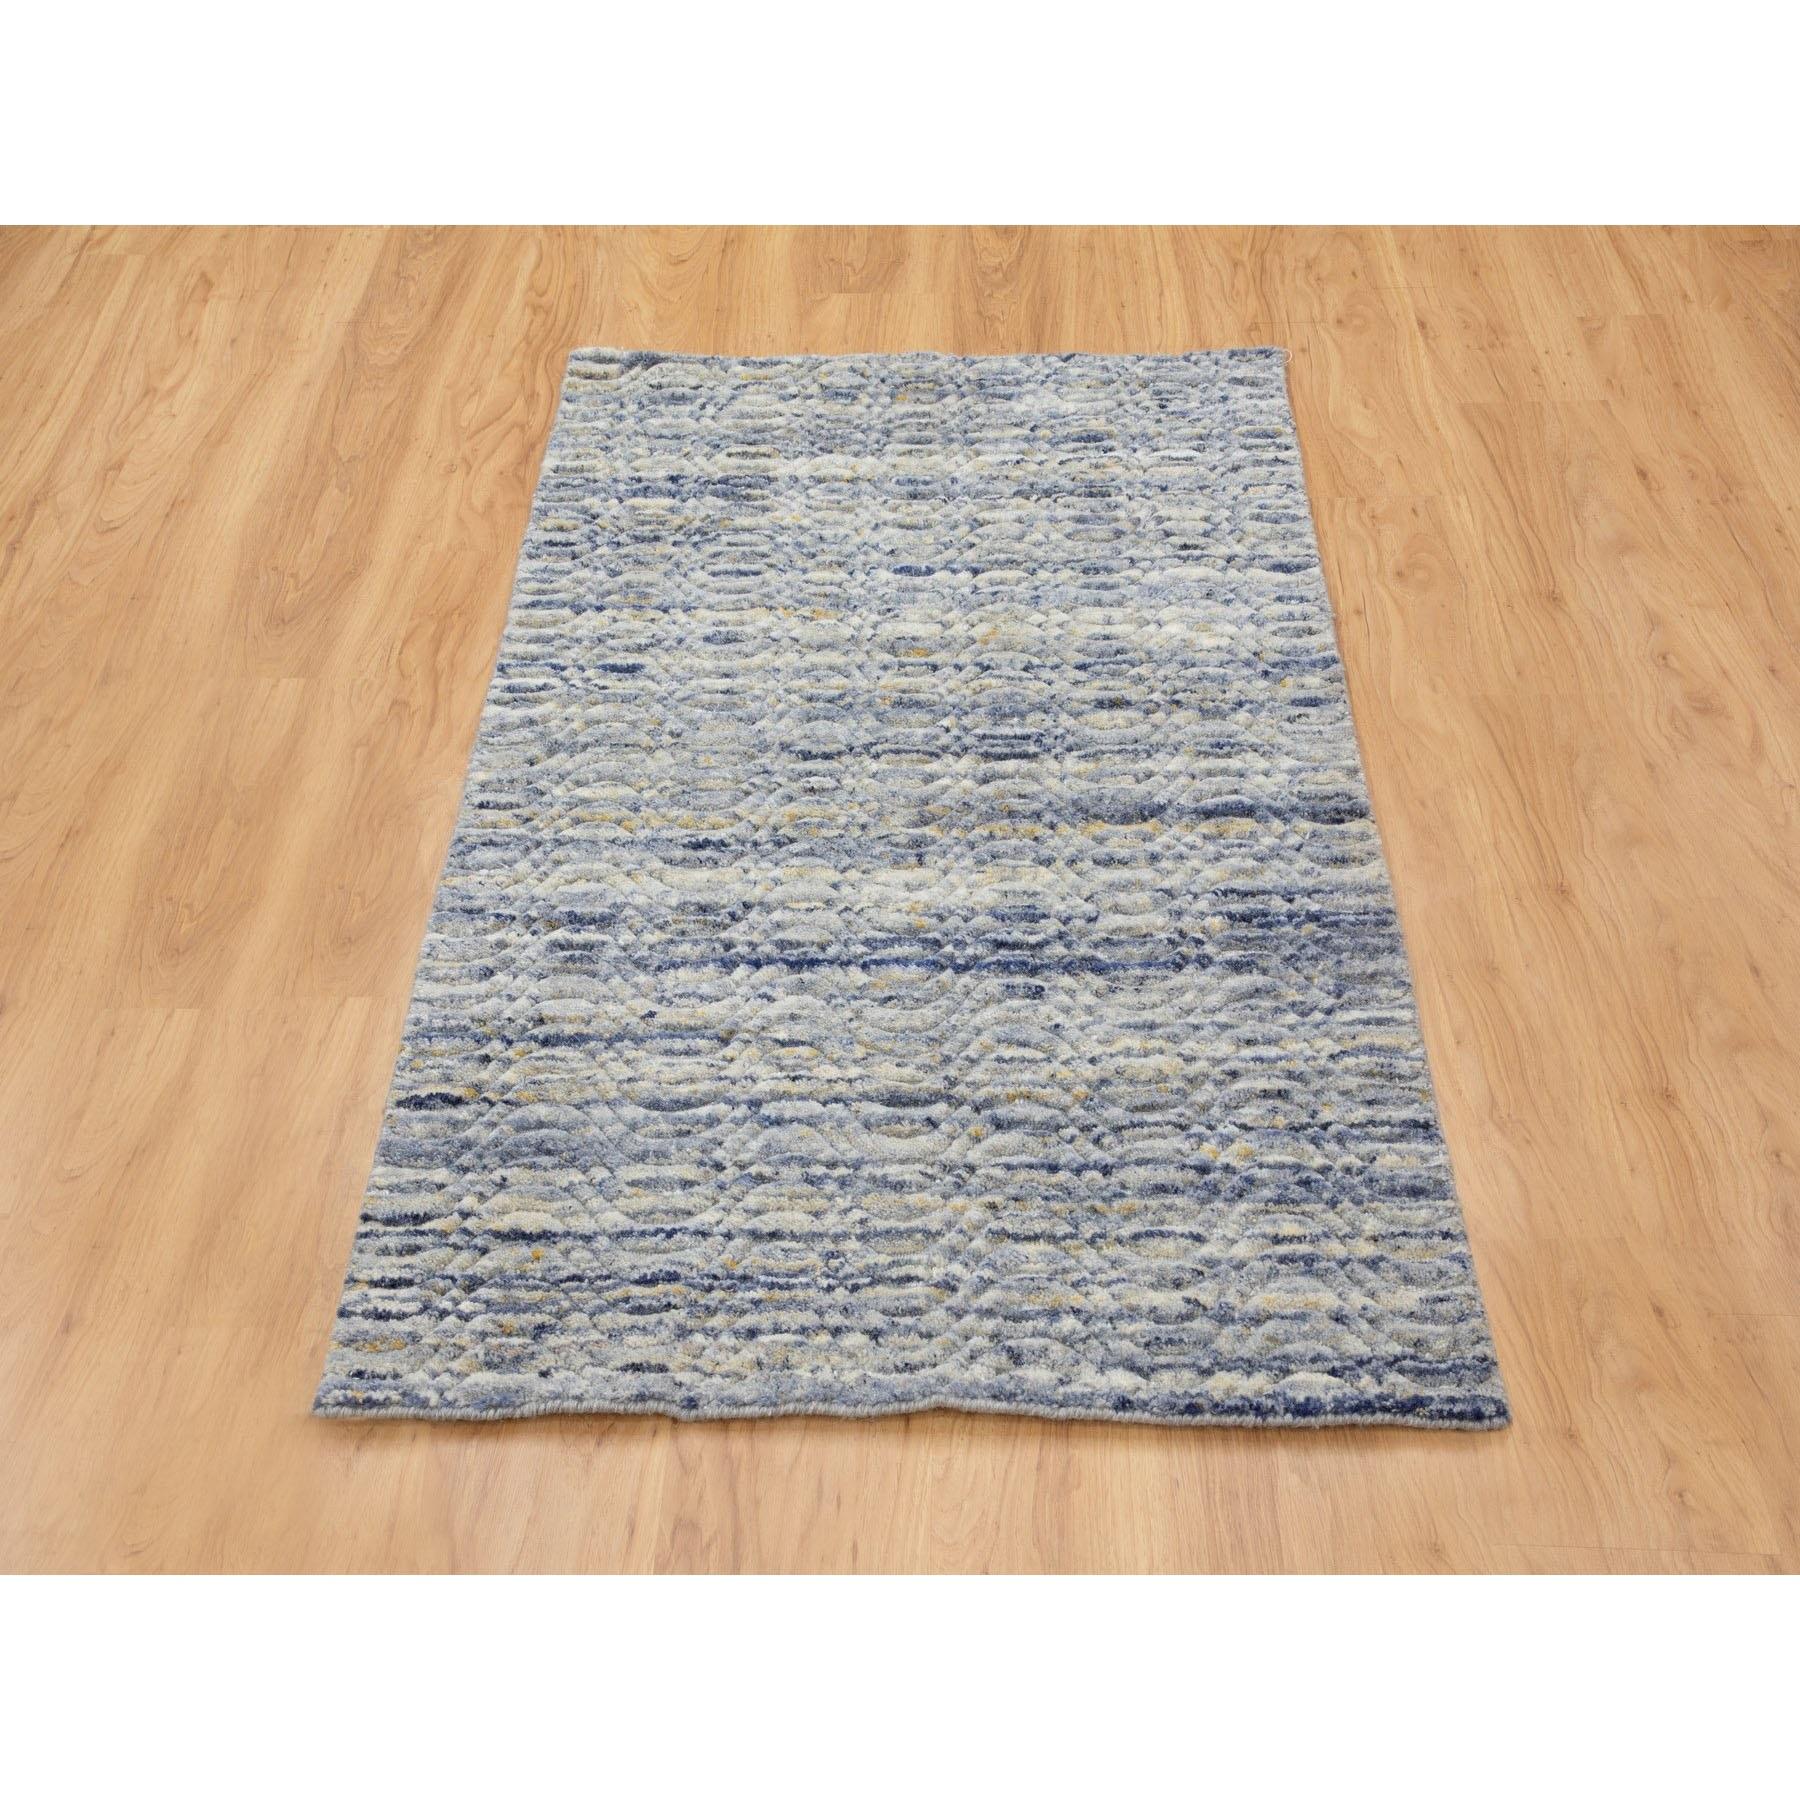 3'x5' Blue Variegated Design Hand Loomed Pure Wool Modern Oriental Rug